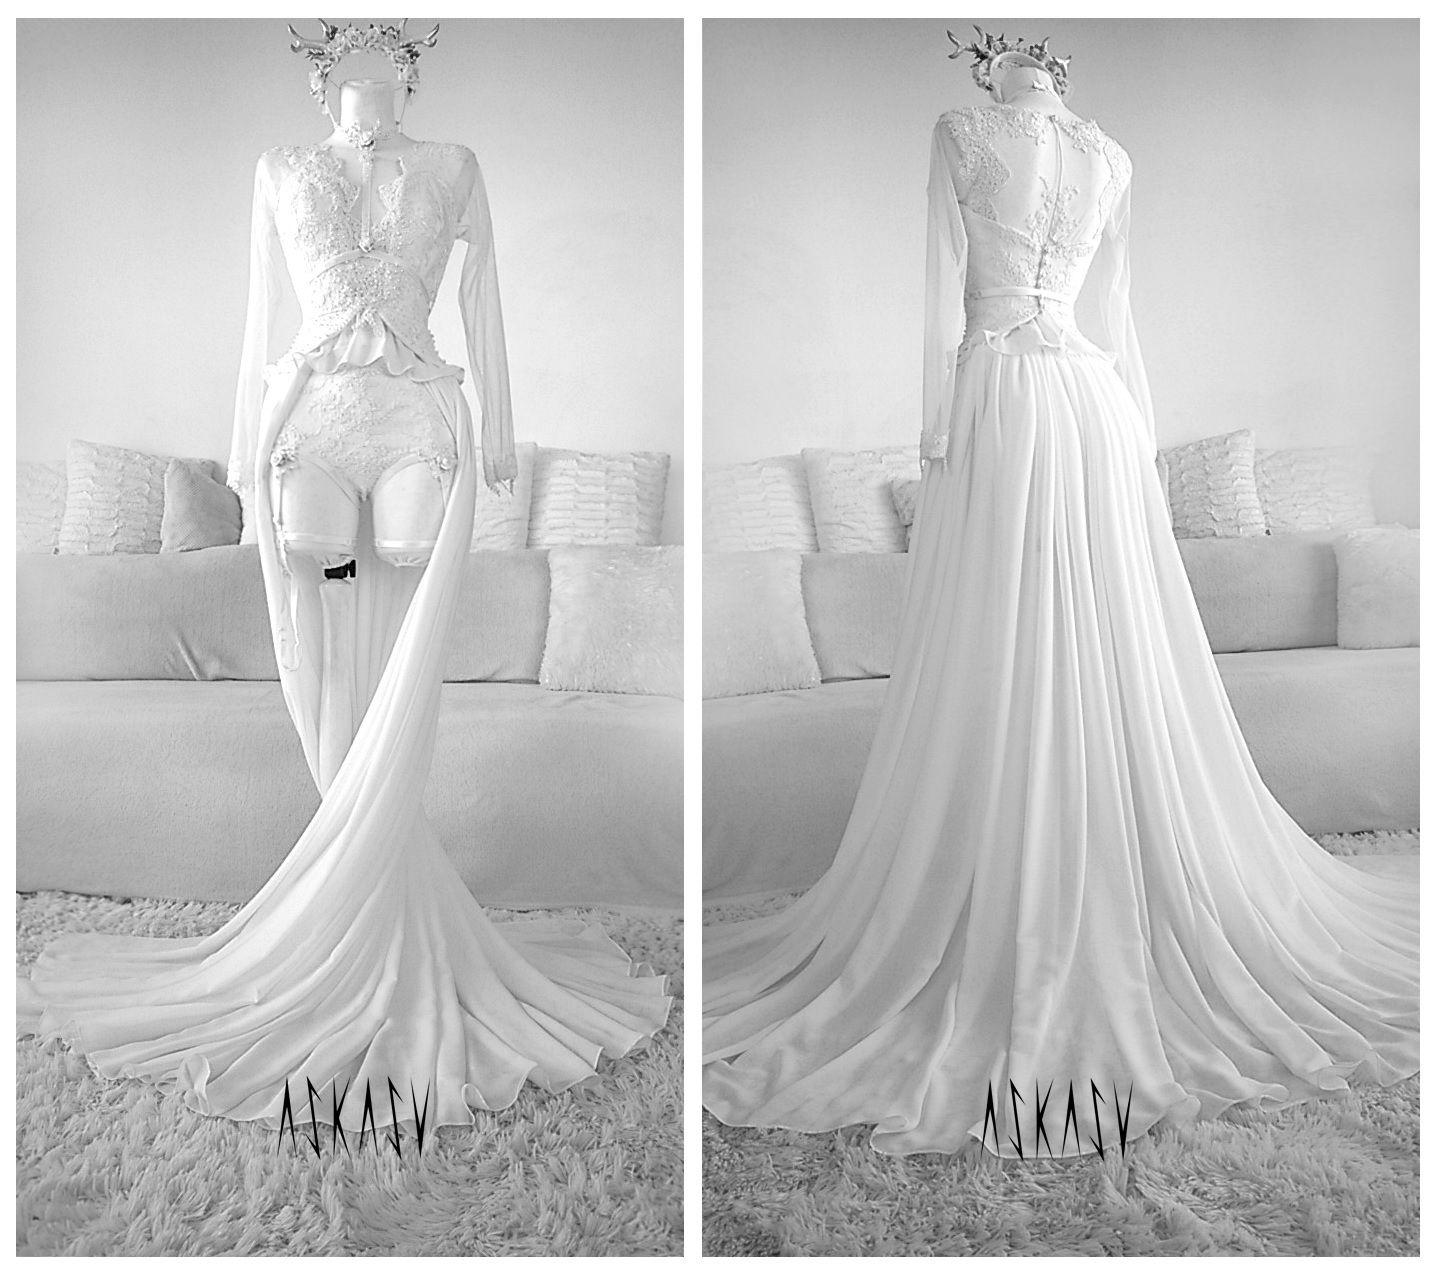 Lace dress gown  gown wedding dresss white goth hautecouture askasu pearls